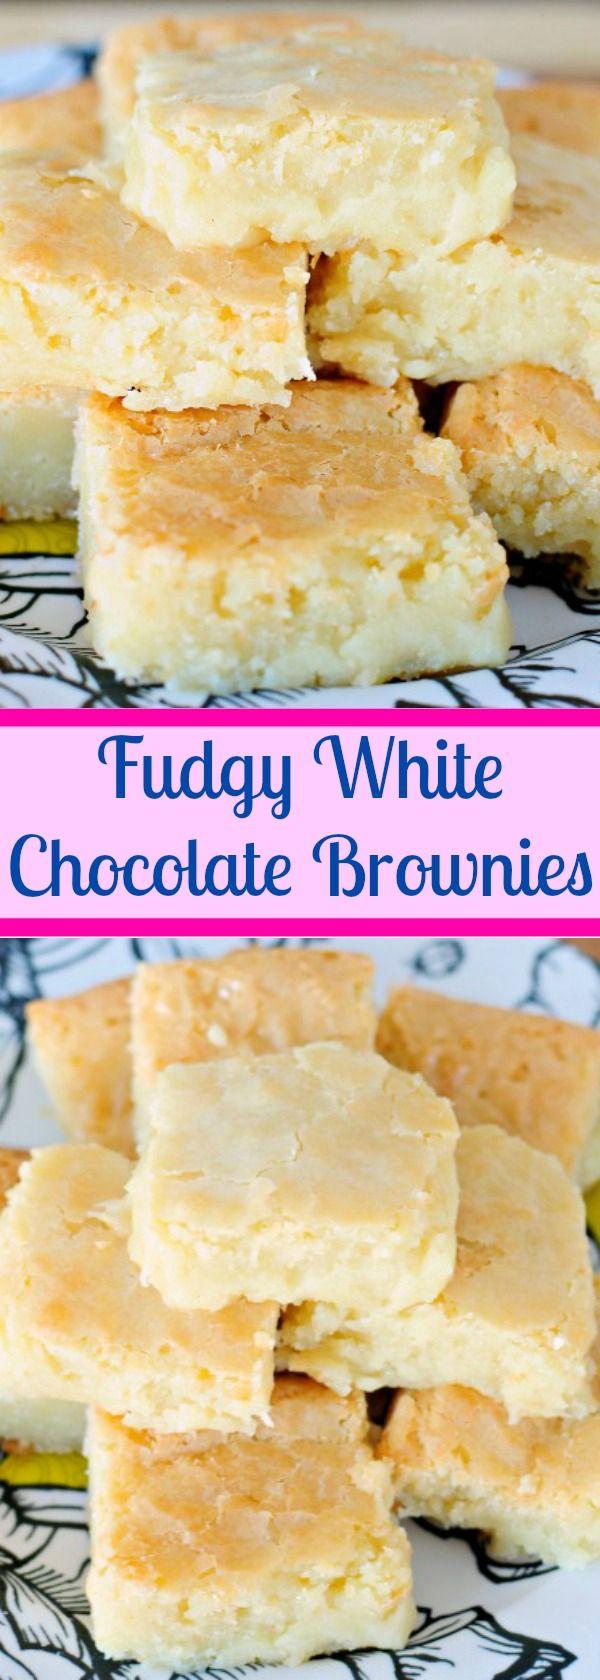 Fudge White Chocolate Brownies